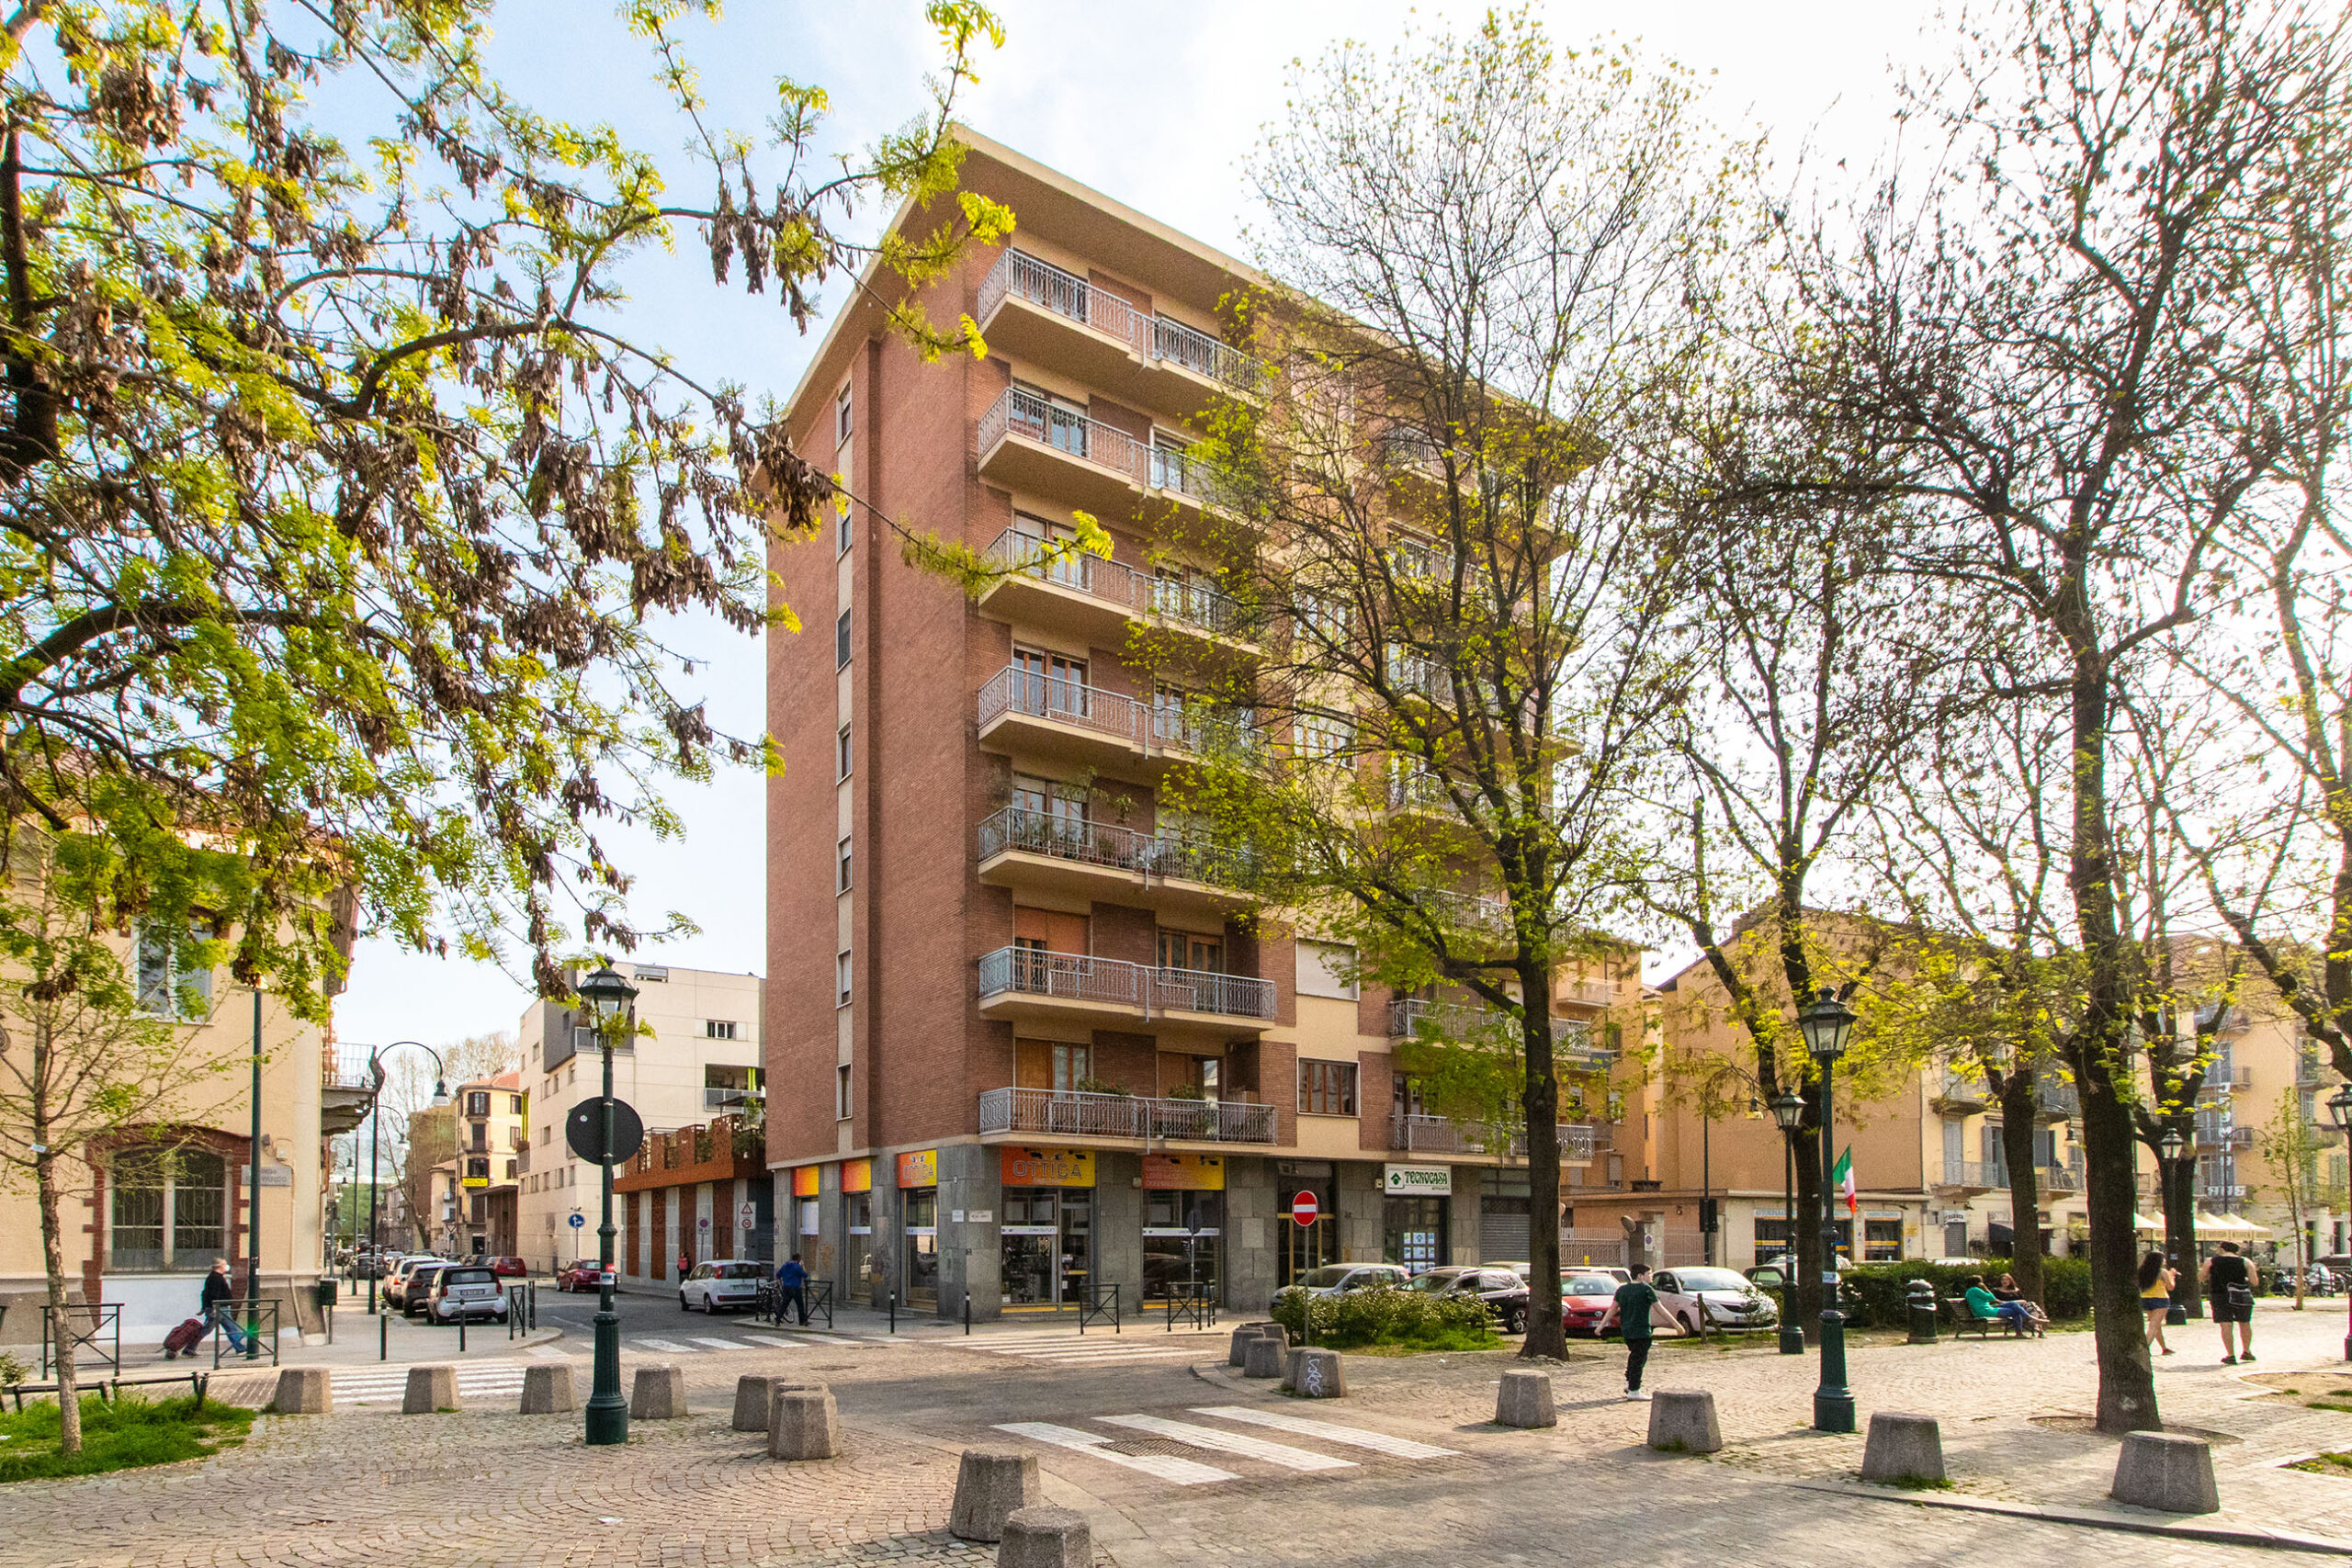 Quadrilocale: Corso Regio Parco, 32, Regio Parco, Torino